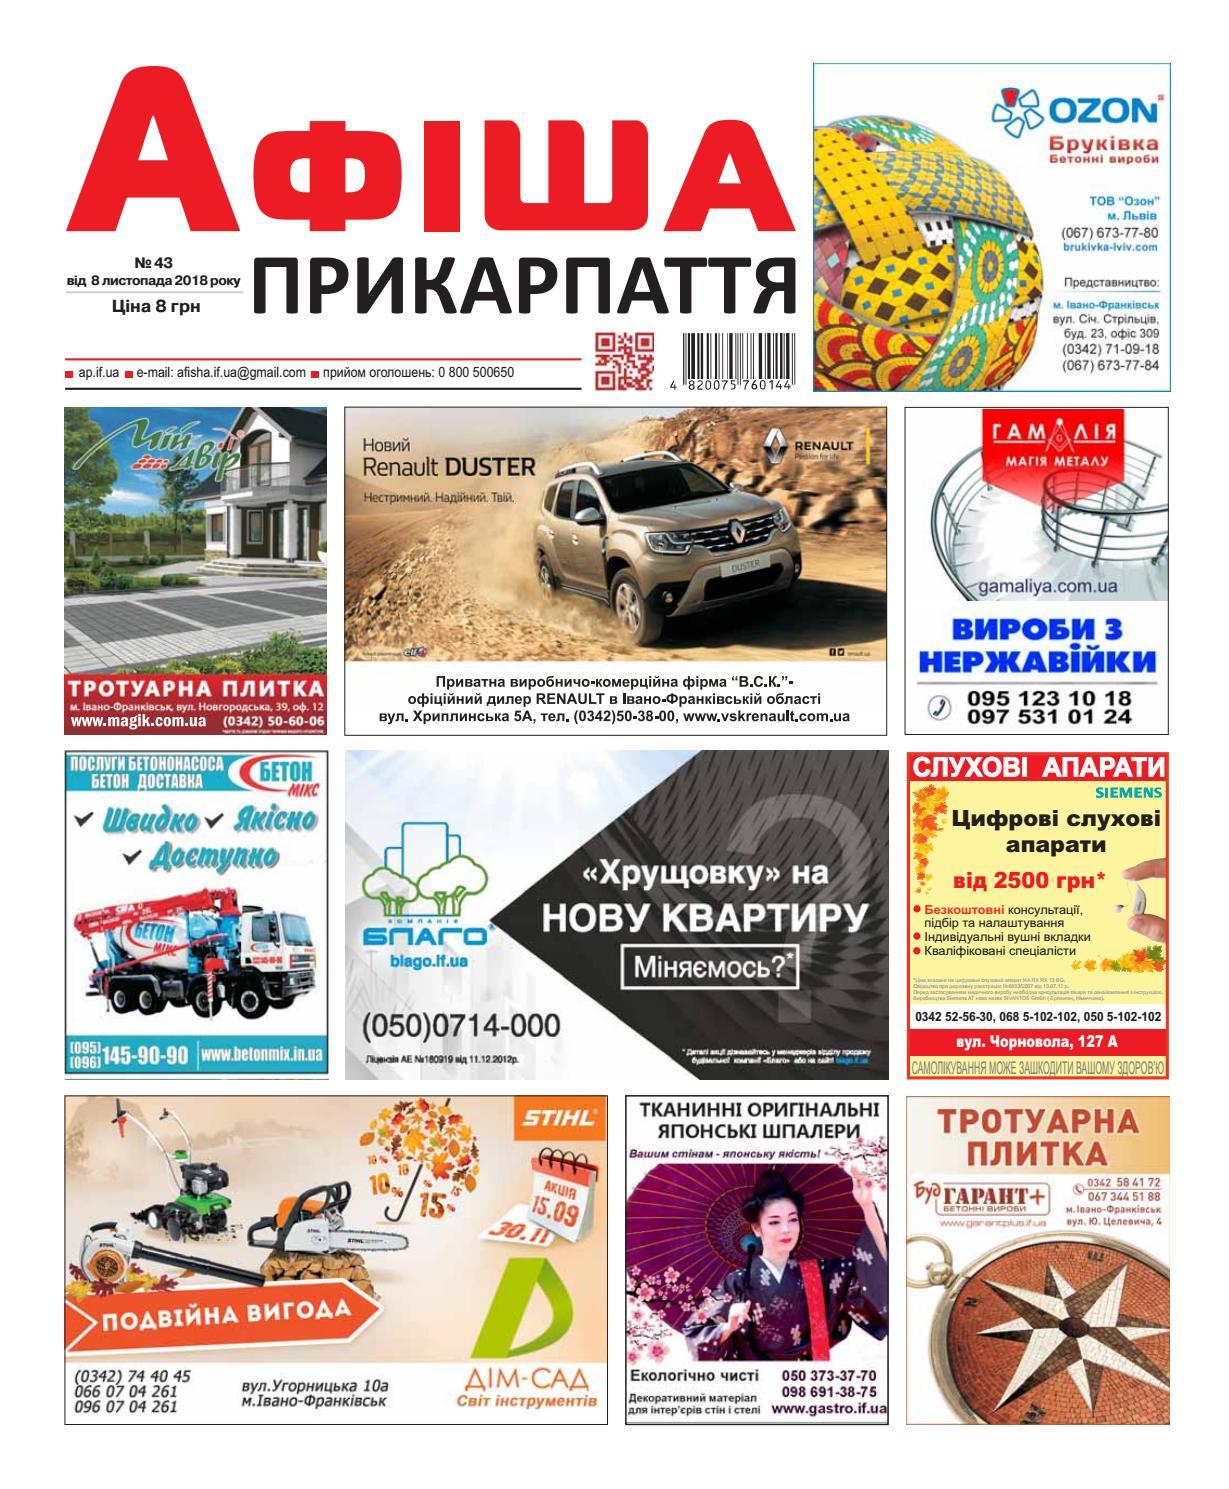 Афіша Прикарпаття № 43 by Olya Olya - issuu b568d41702e76